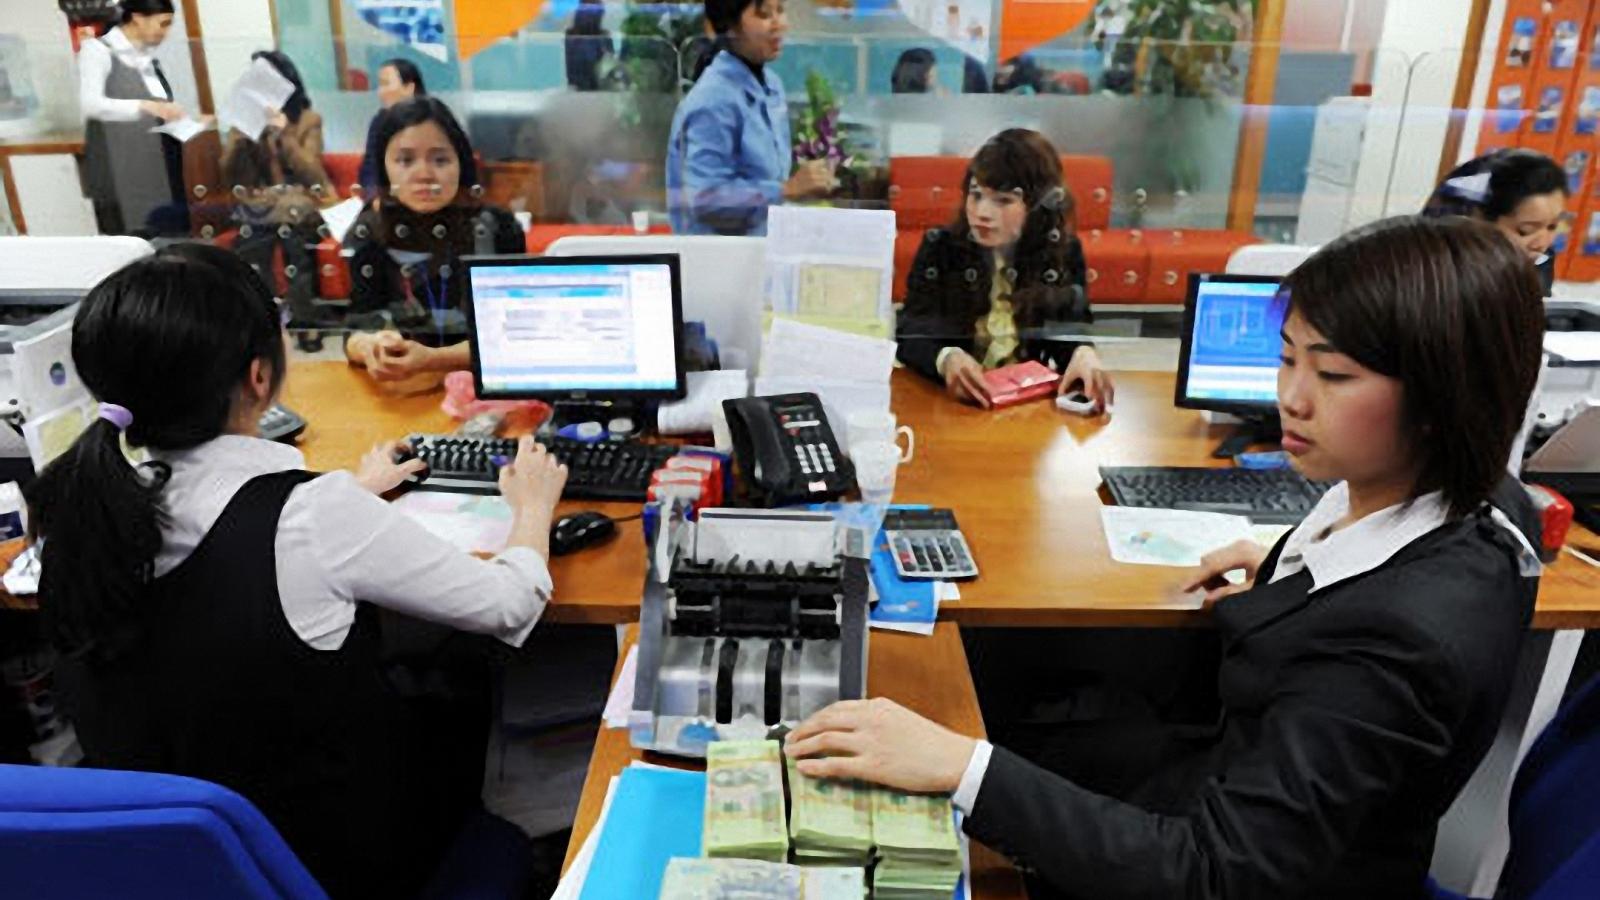 Banks to raise capital to meet Basel II standards